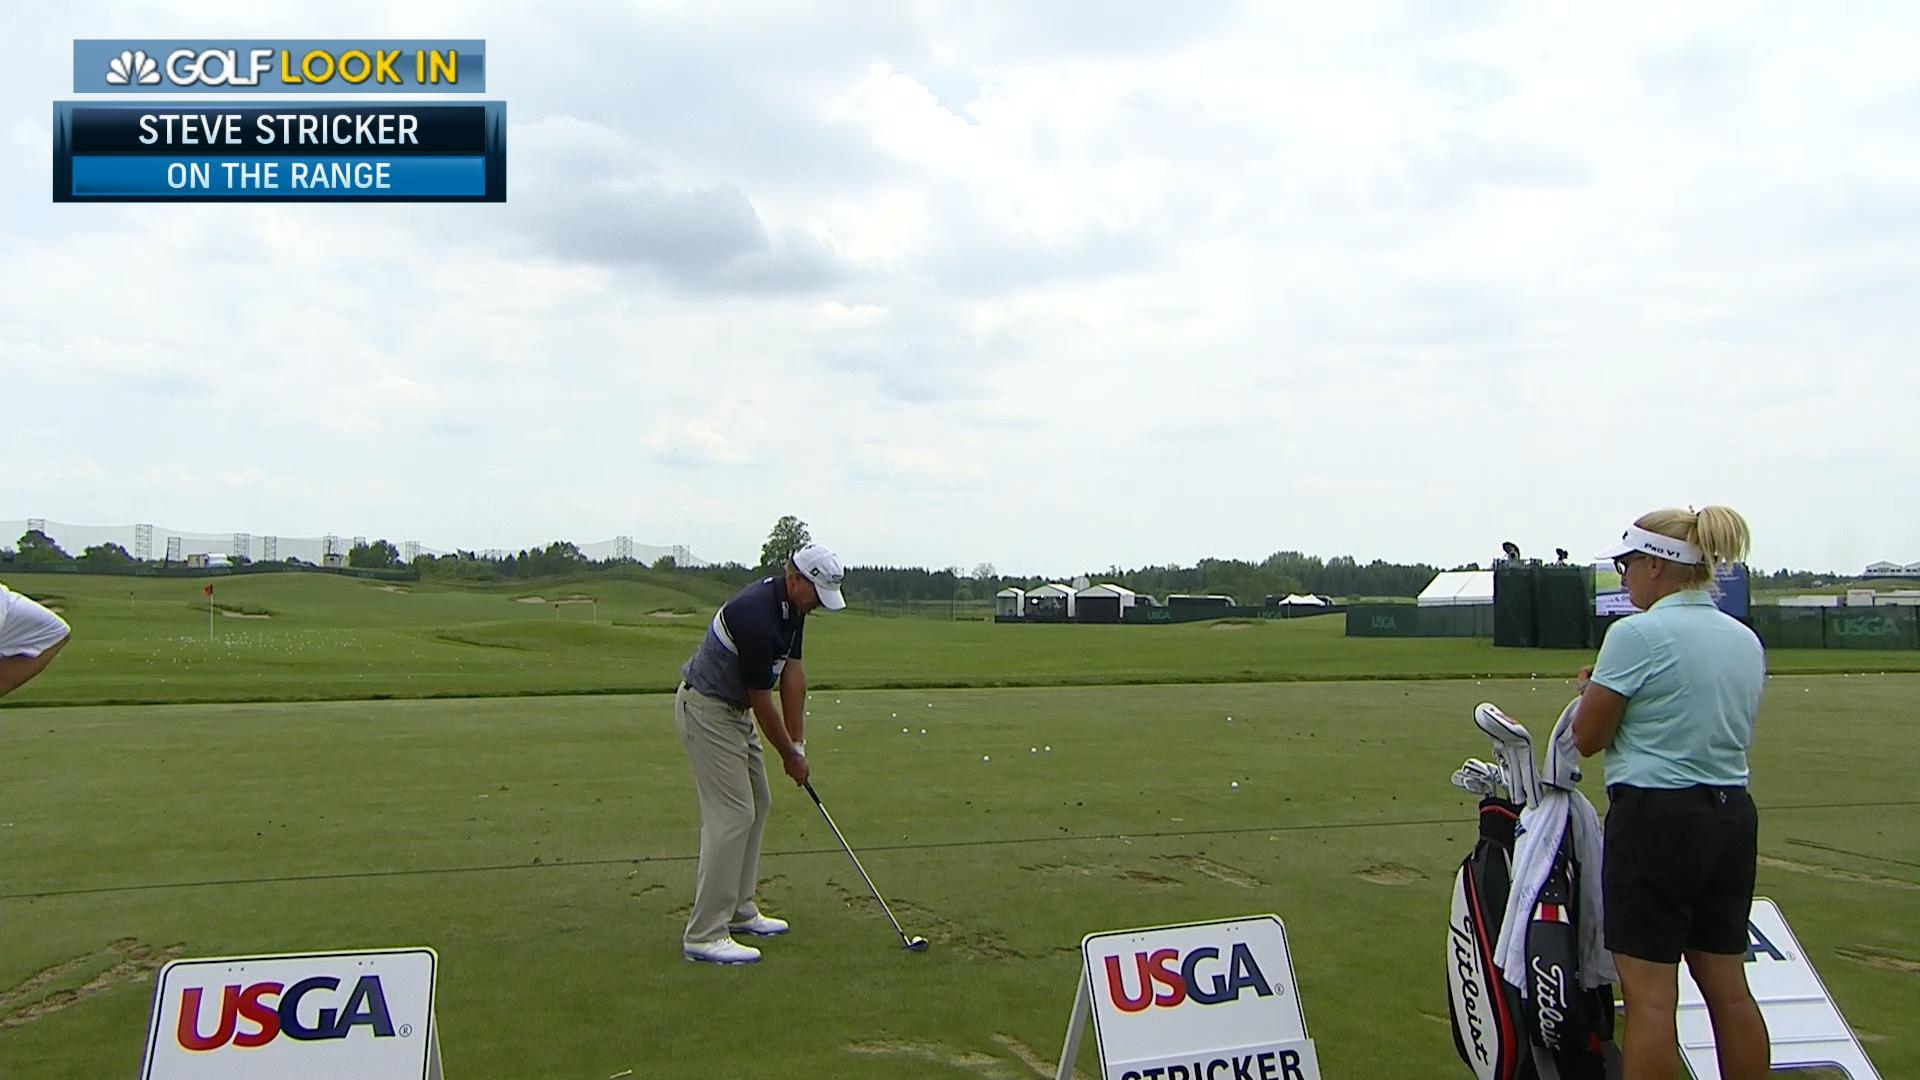 2017 U.S. Open Golf Championship Highlights | Golf Channel